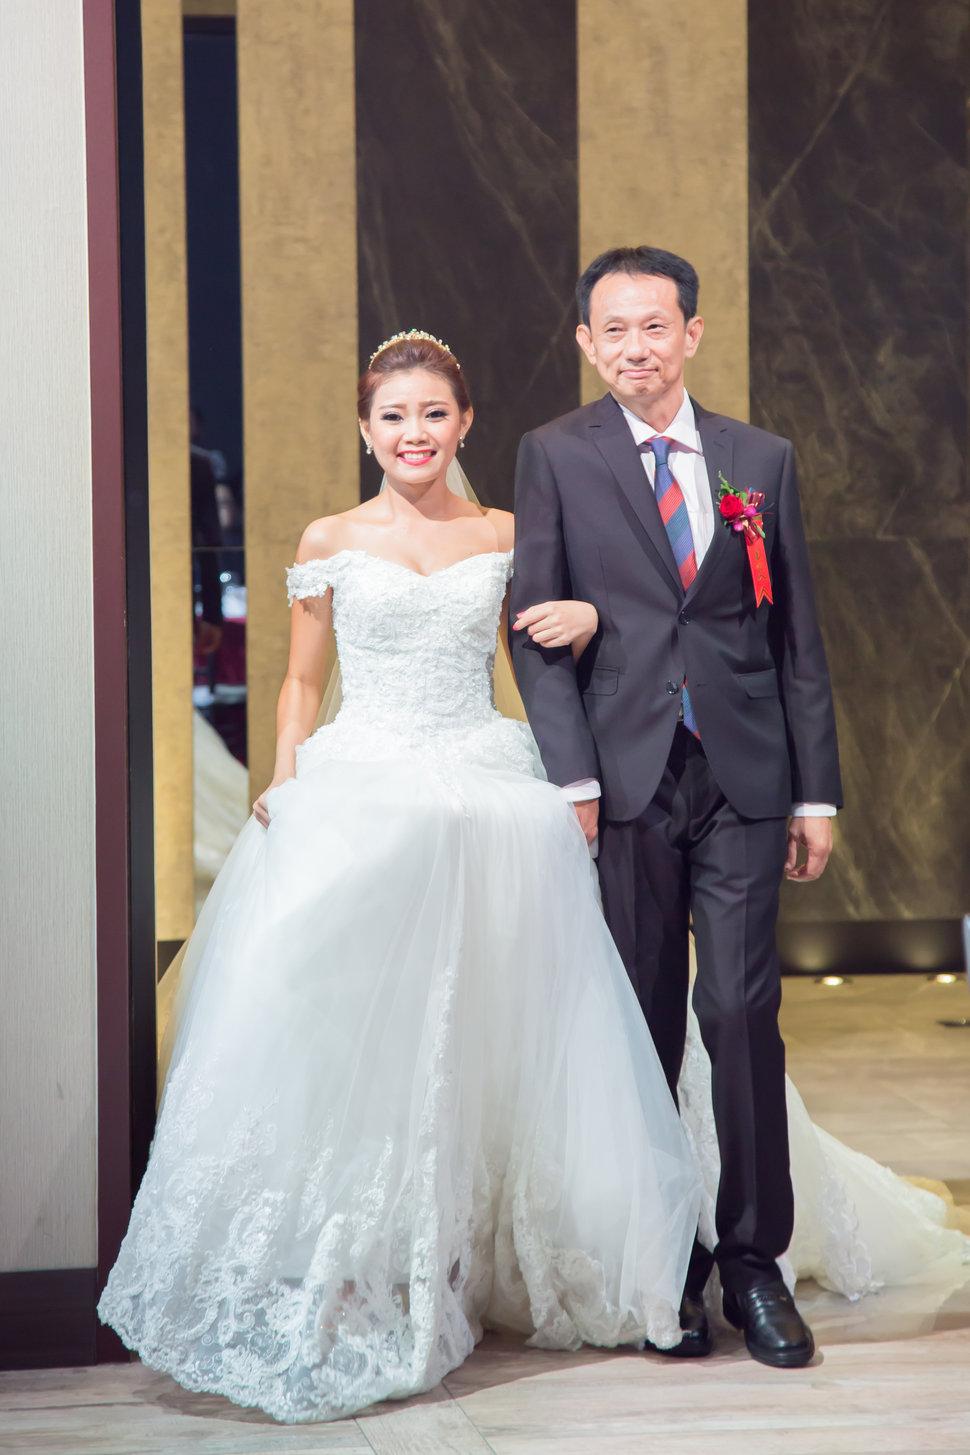 5K0B3187 - TOTO_Photo - 結婚吧